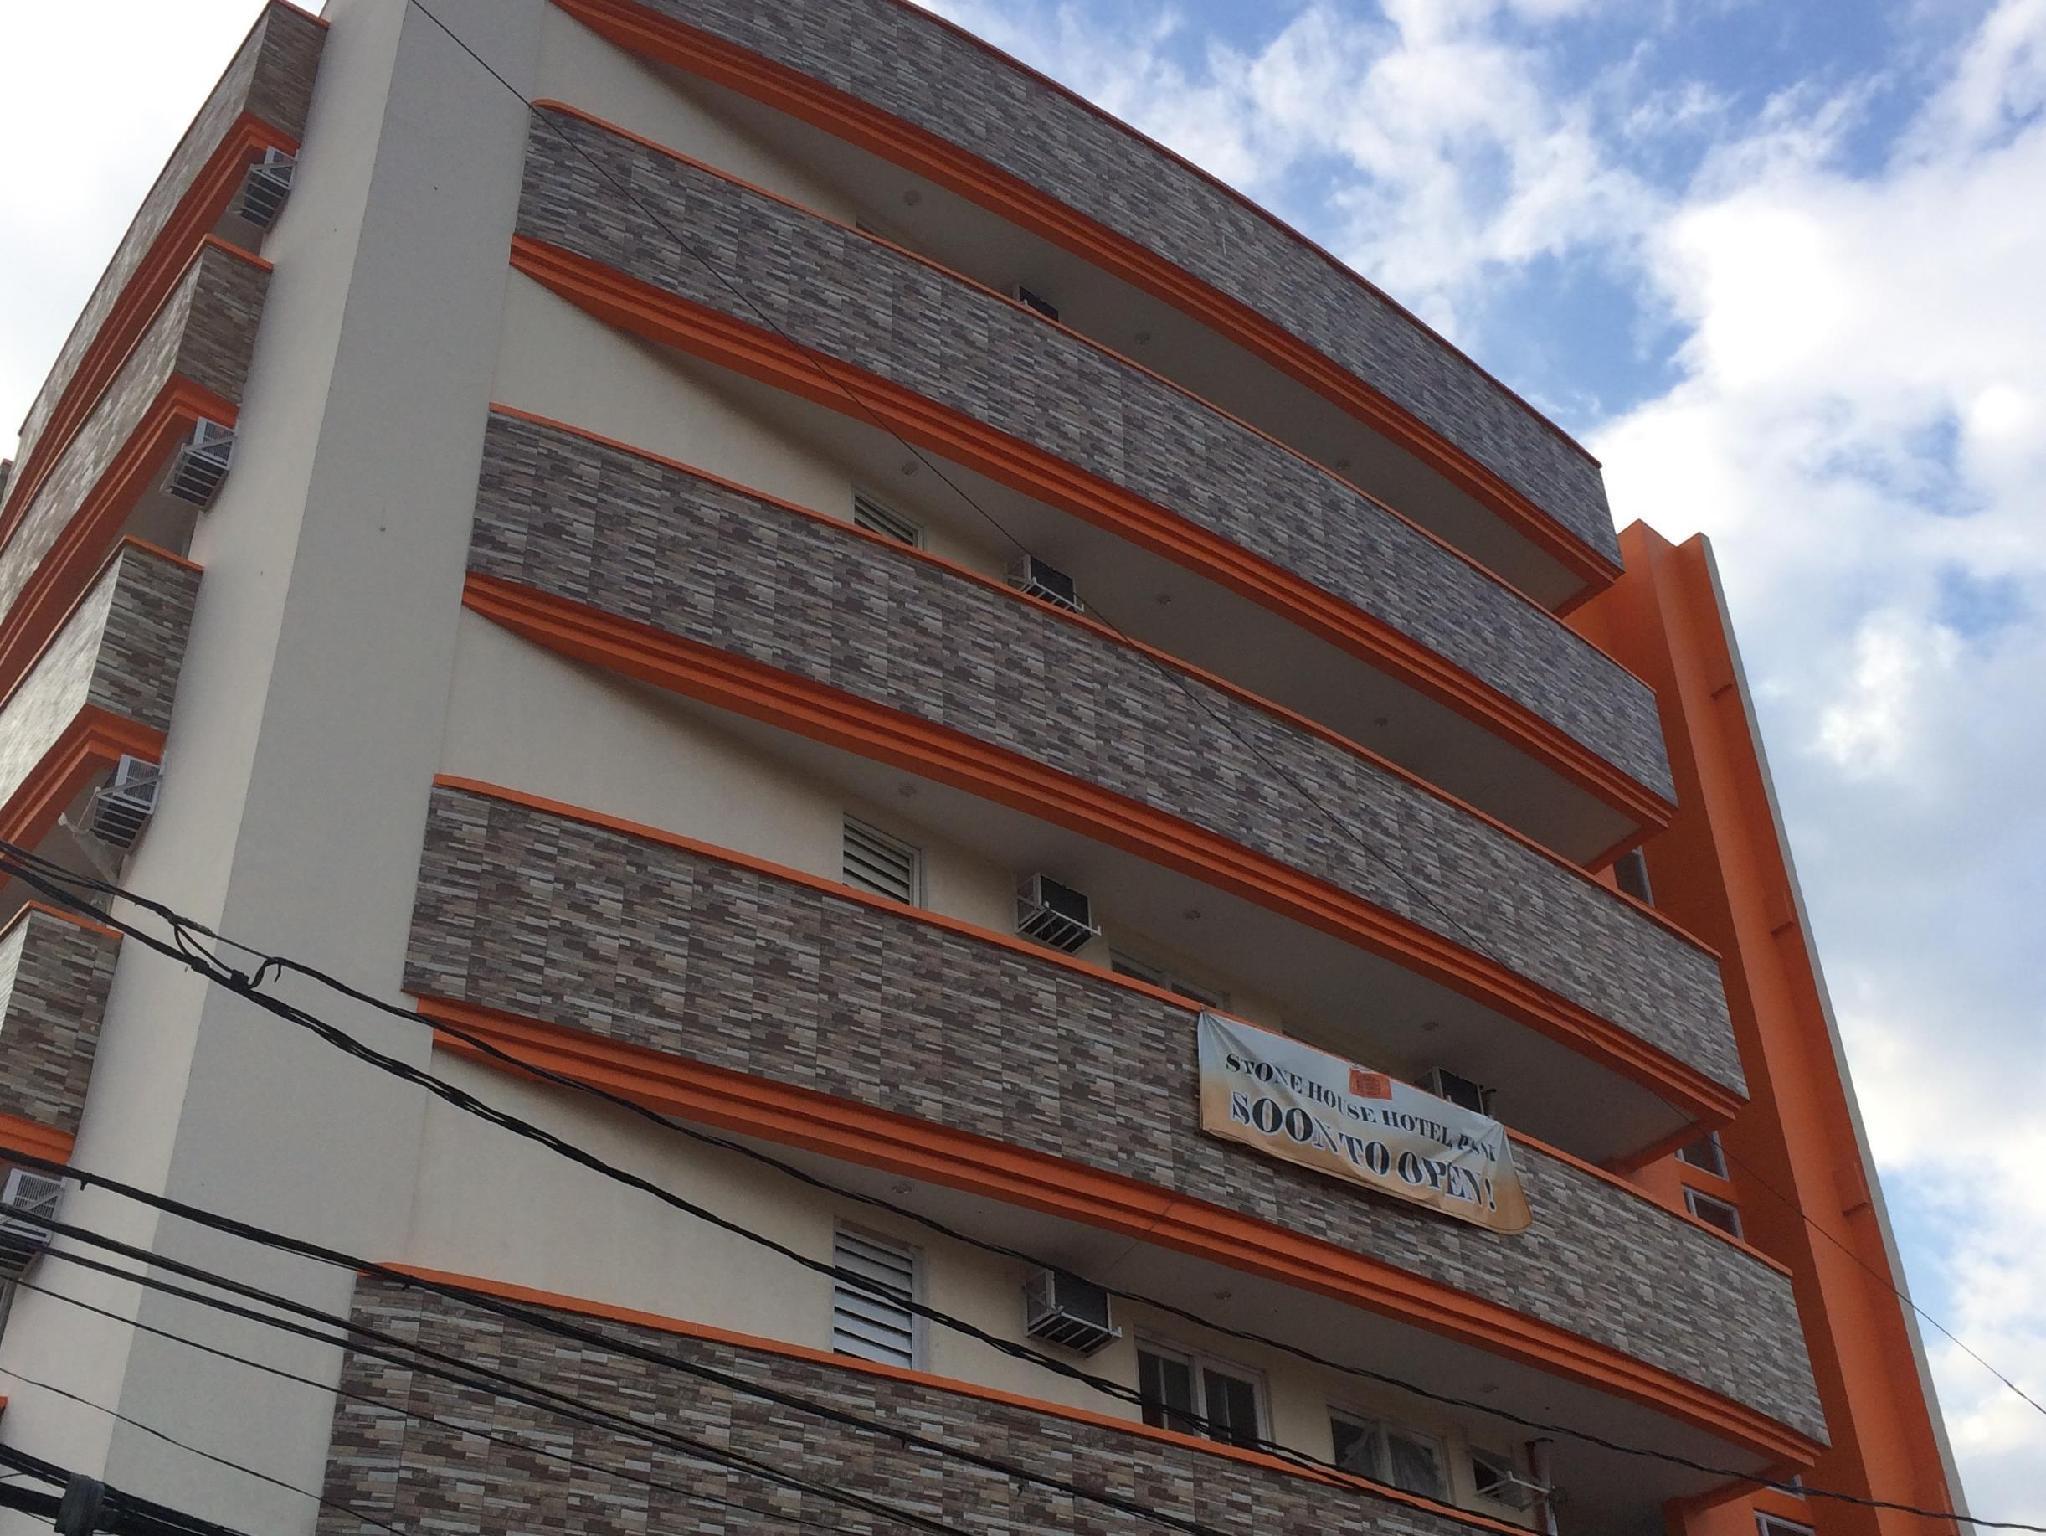 Stone House Hotel Pasay, Pasay City